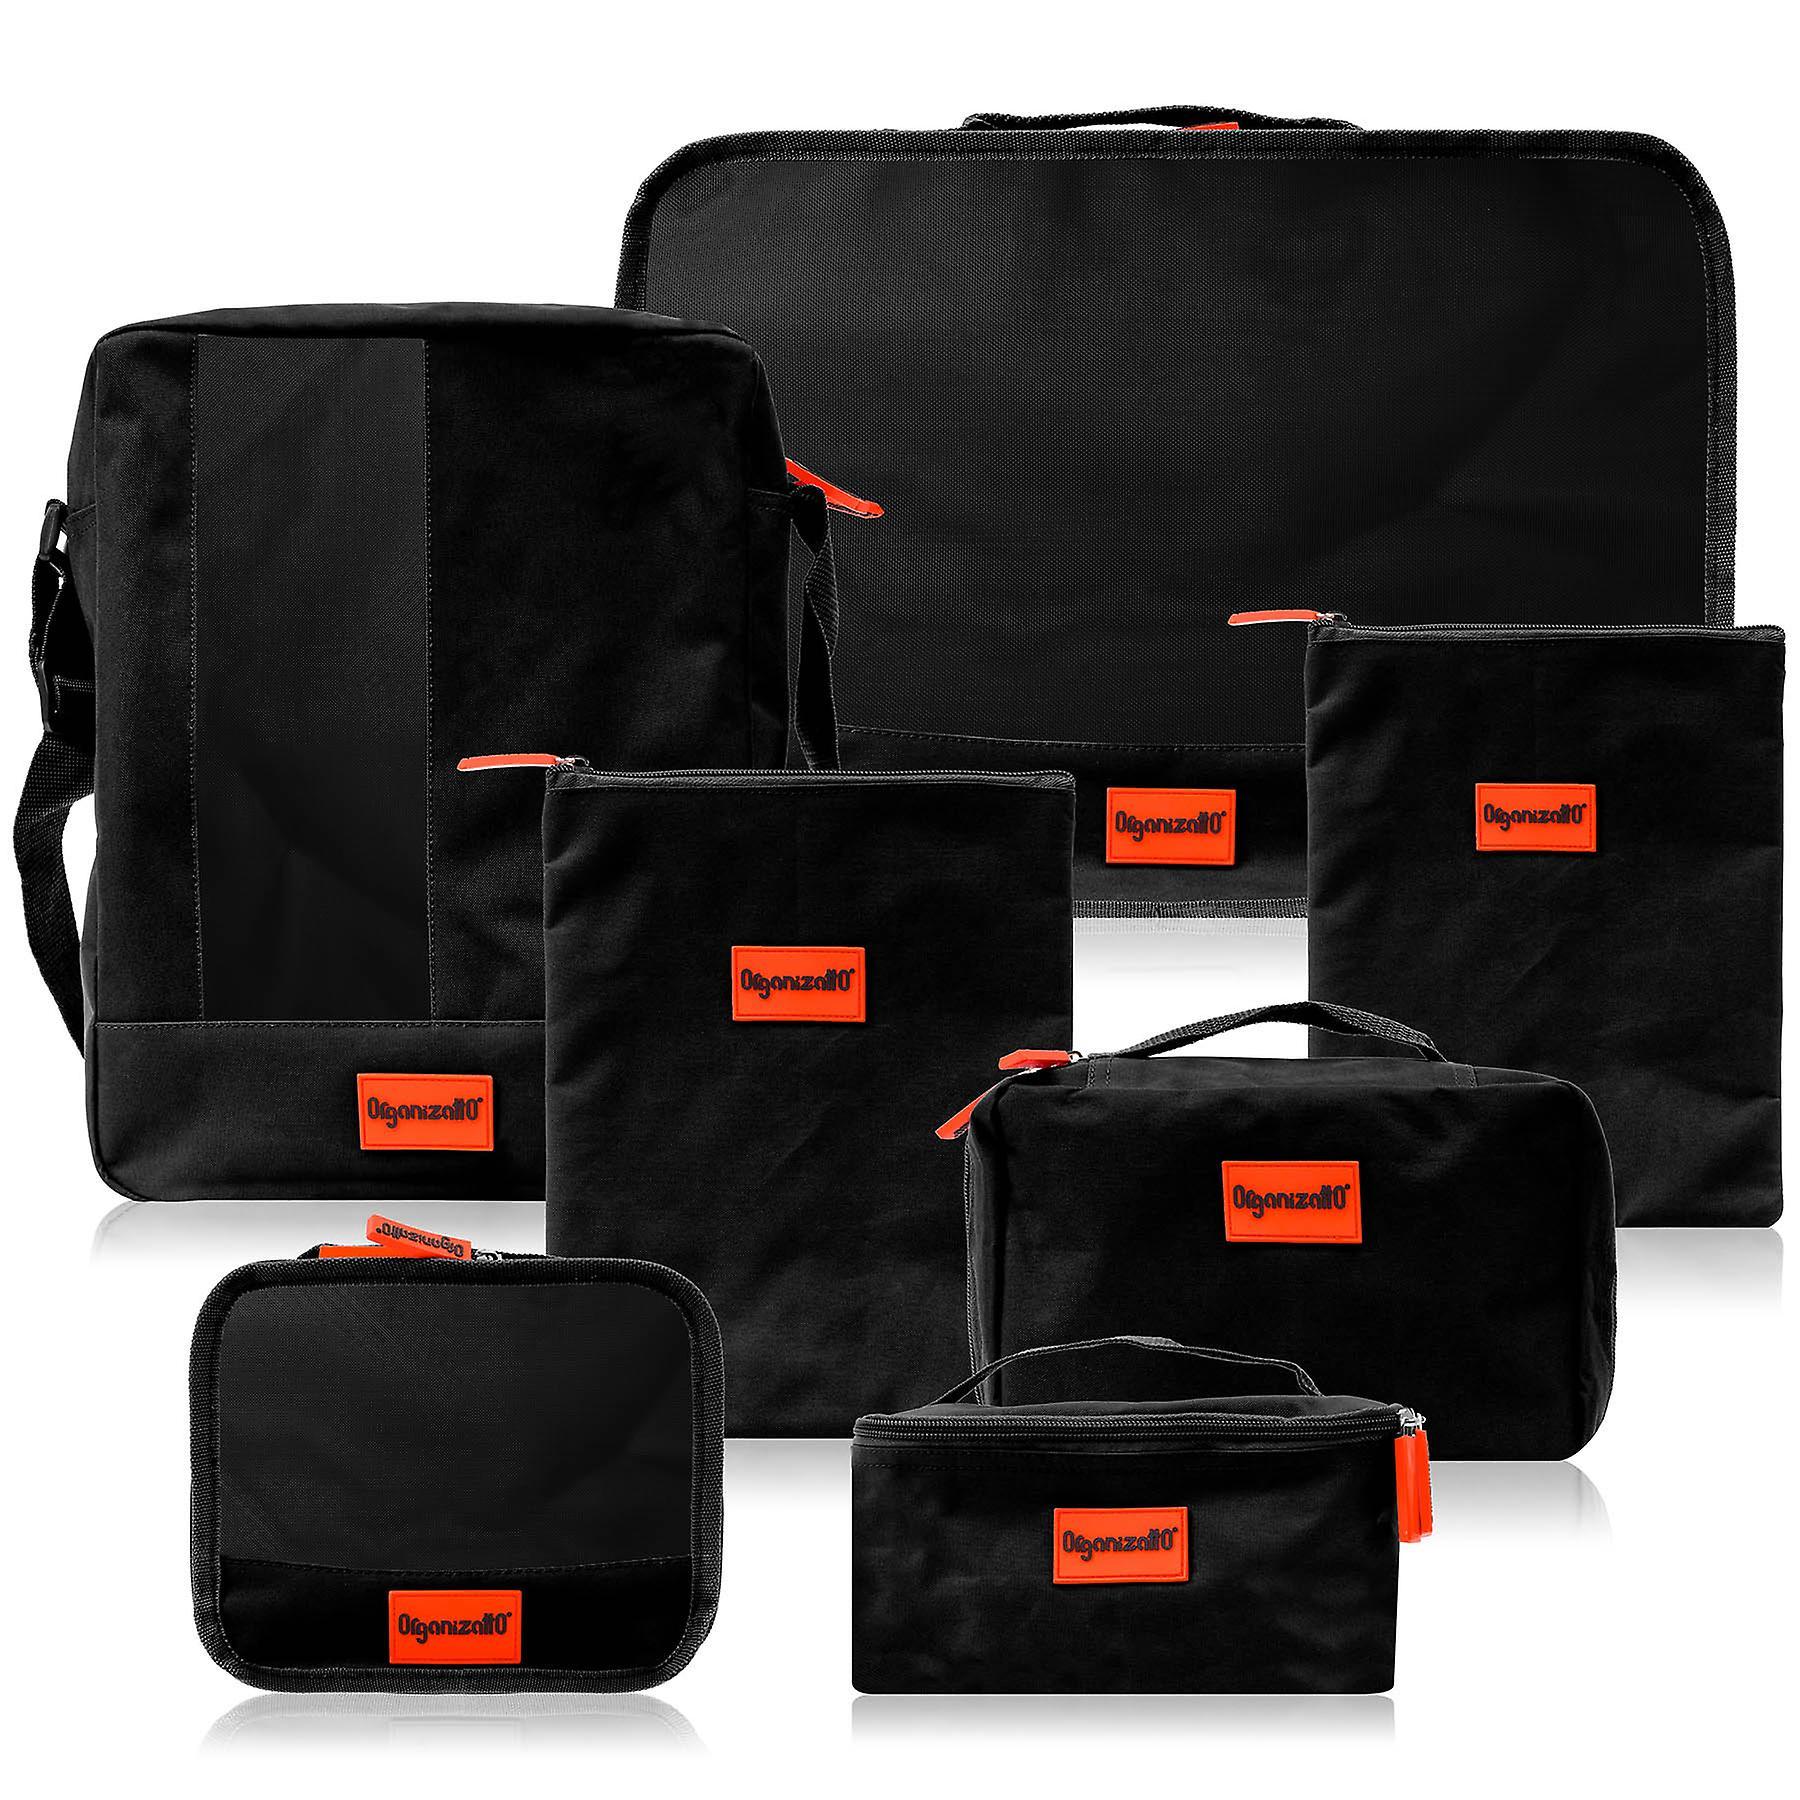 SHANY 7 in 1 Travel Cosmetics Makeup Organizer Packing Bag set - Noir